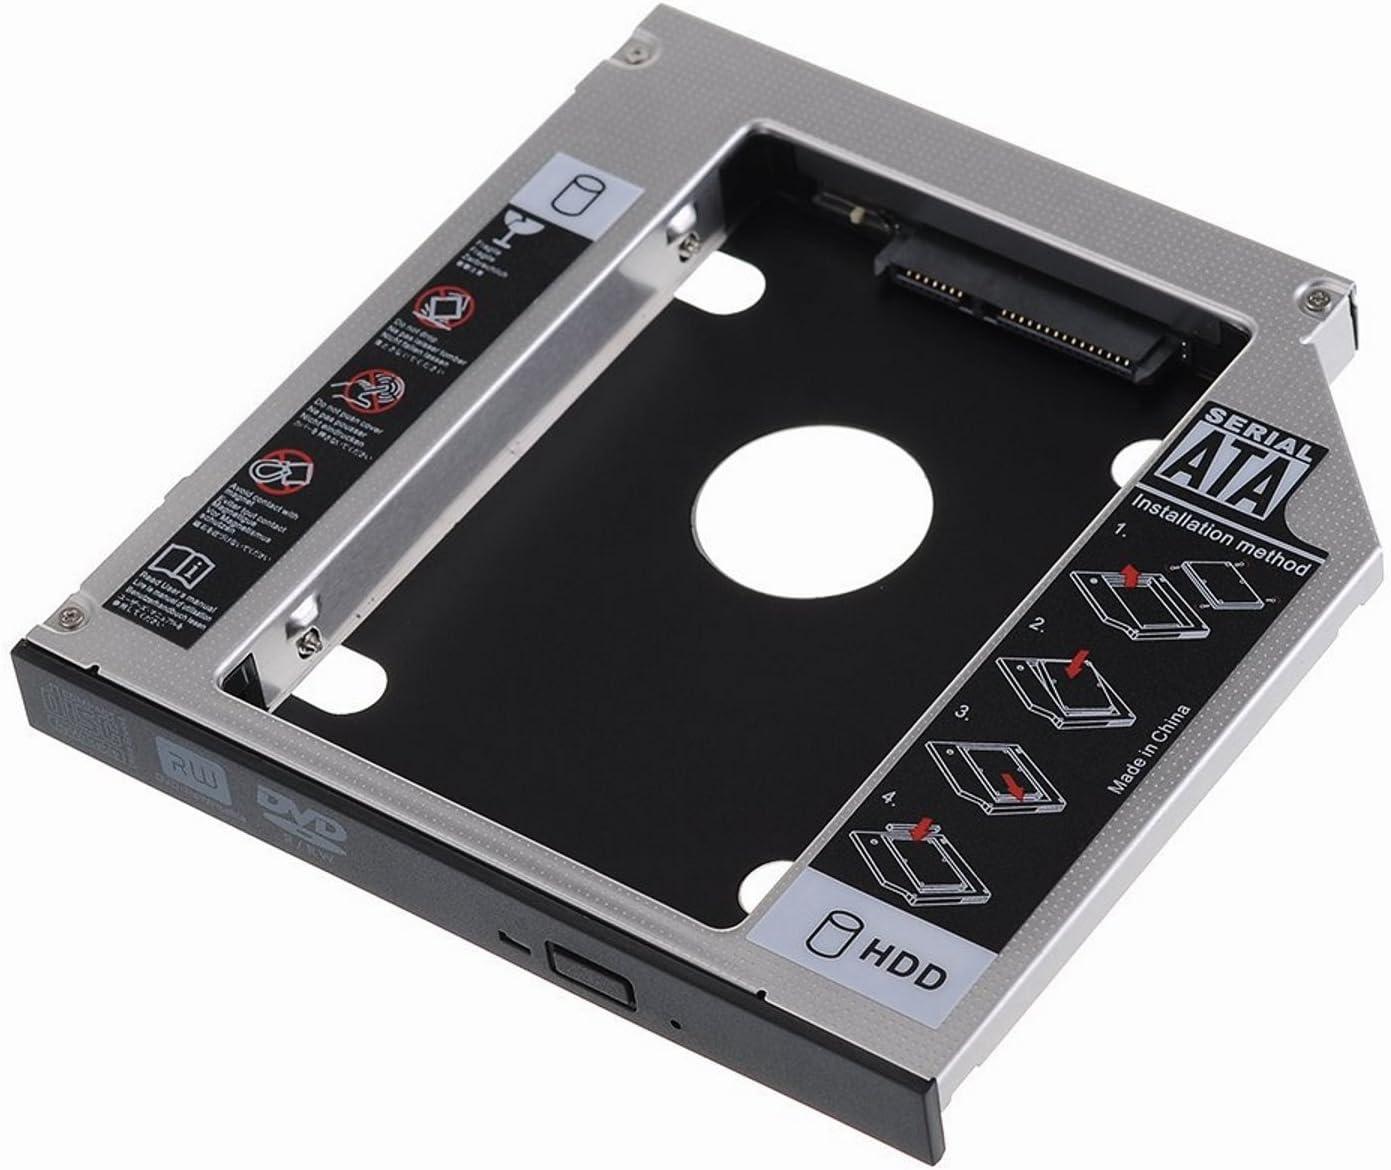 SATA III SSD/HDD Caja de instalación en Optical bahìa CD/DVD/BLU-Ray de 12.7 mm de Altura